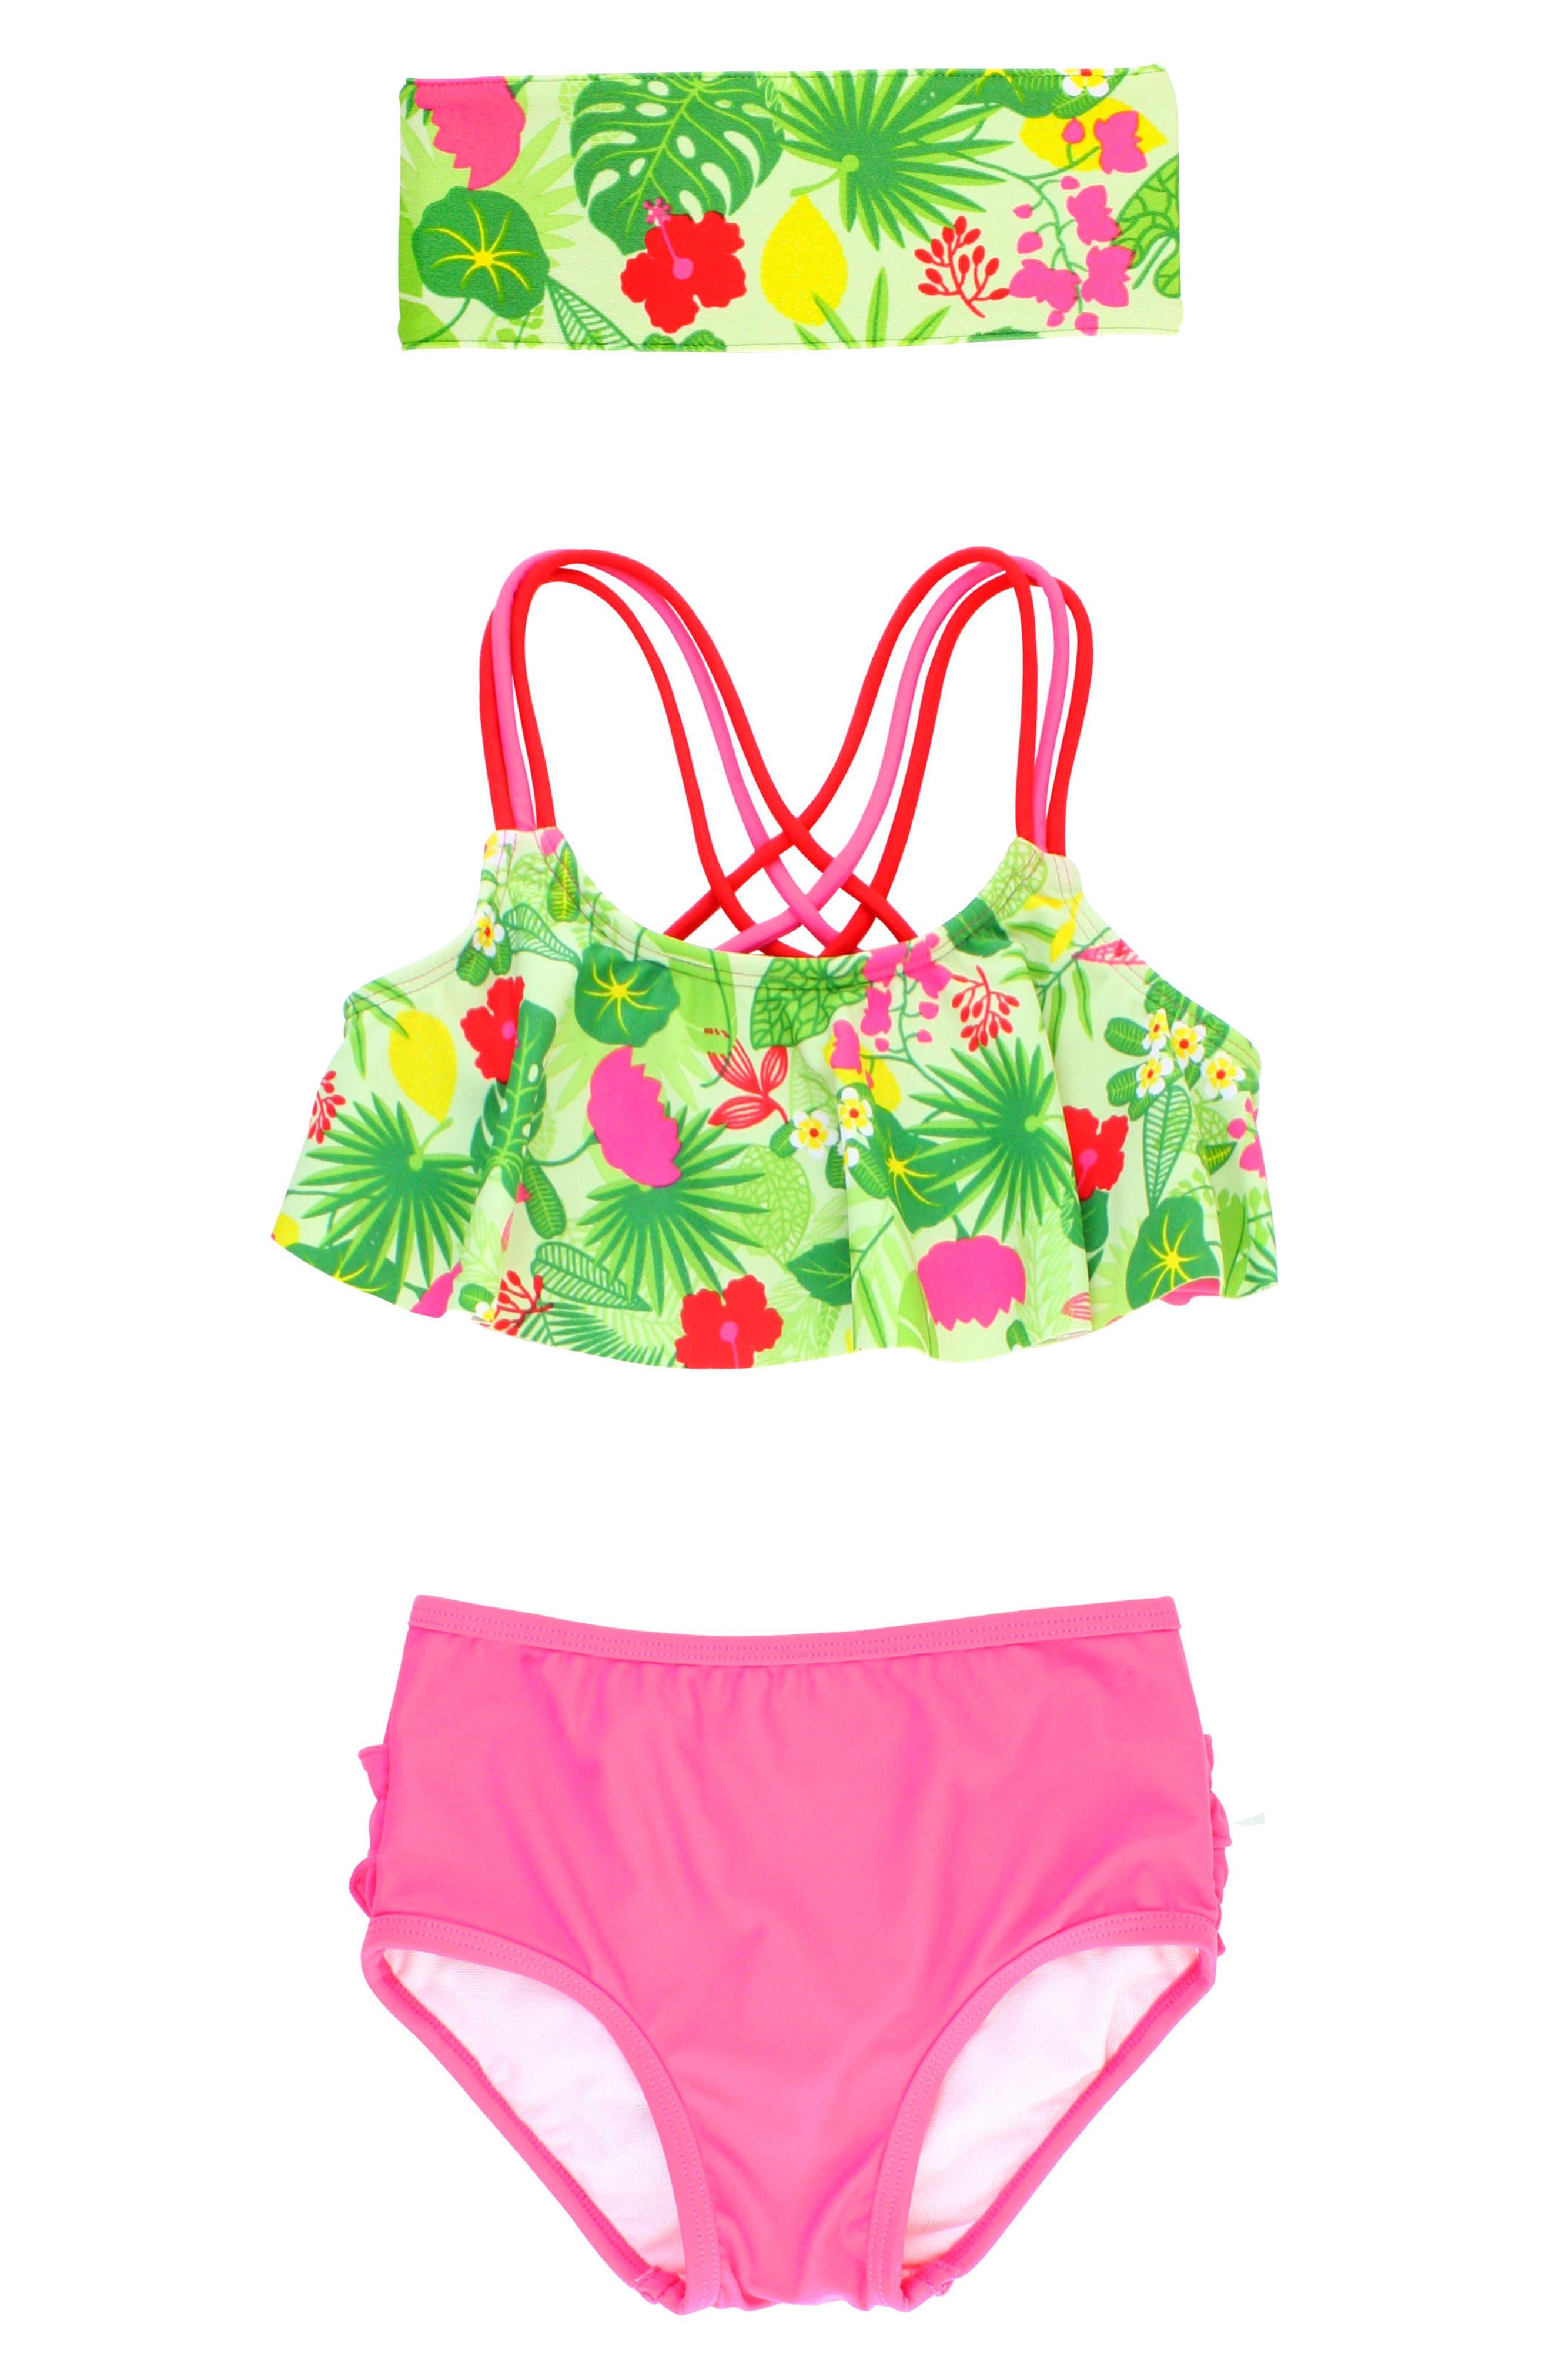 Tropical Two-Piece Swimsuit & Headband Set,                             Main thumbnail 1, color,                             320